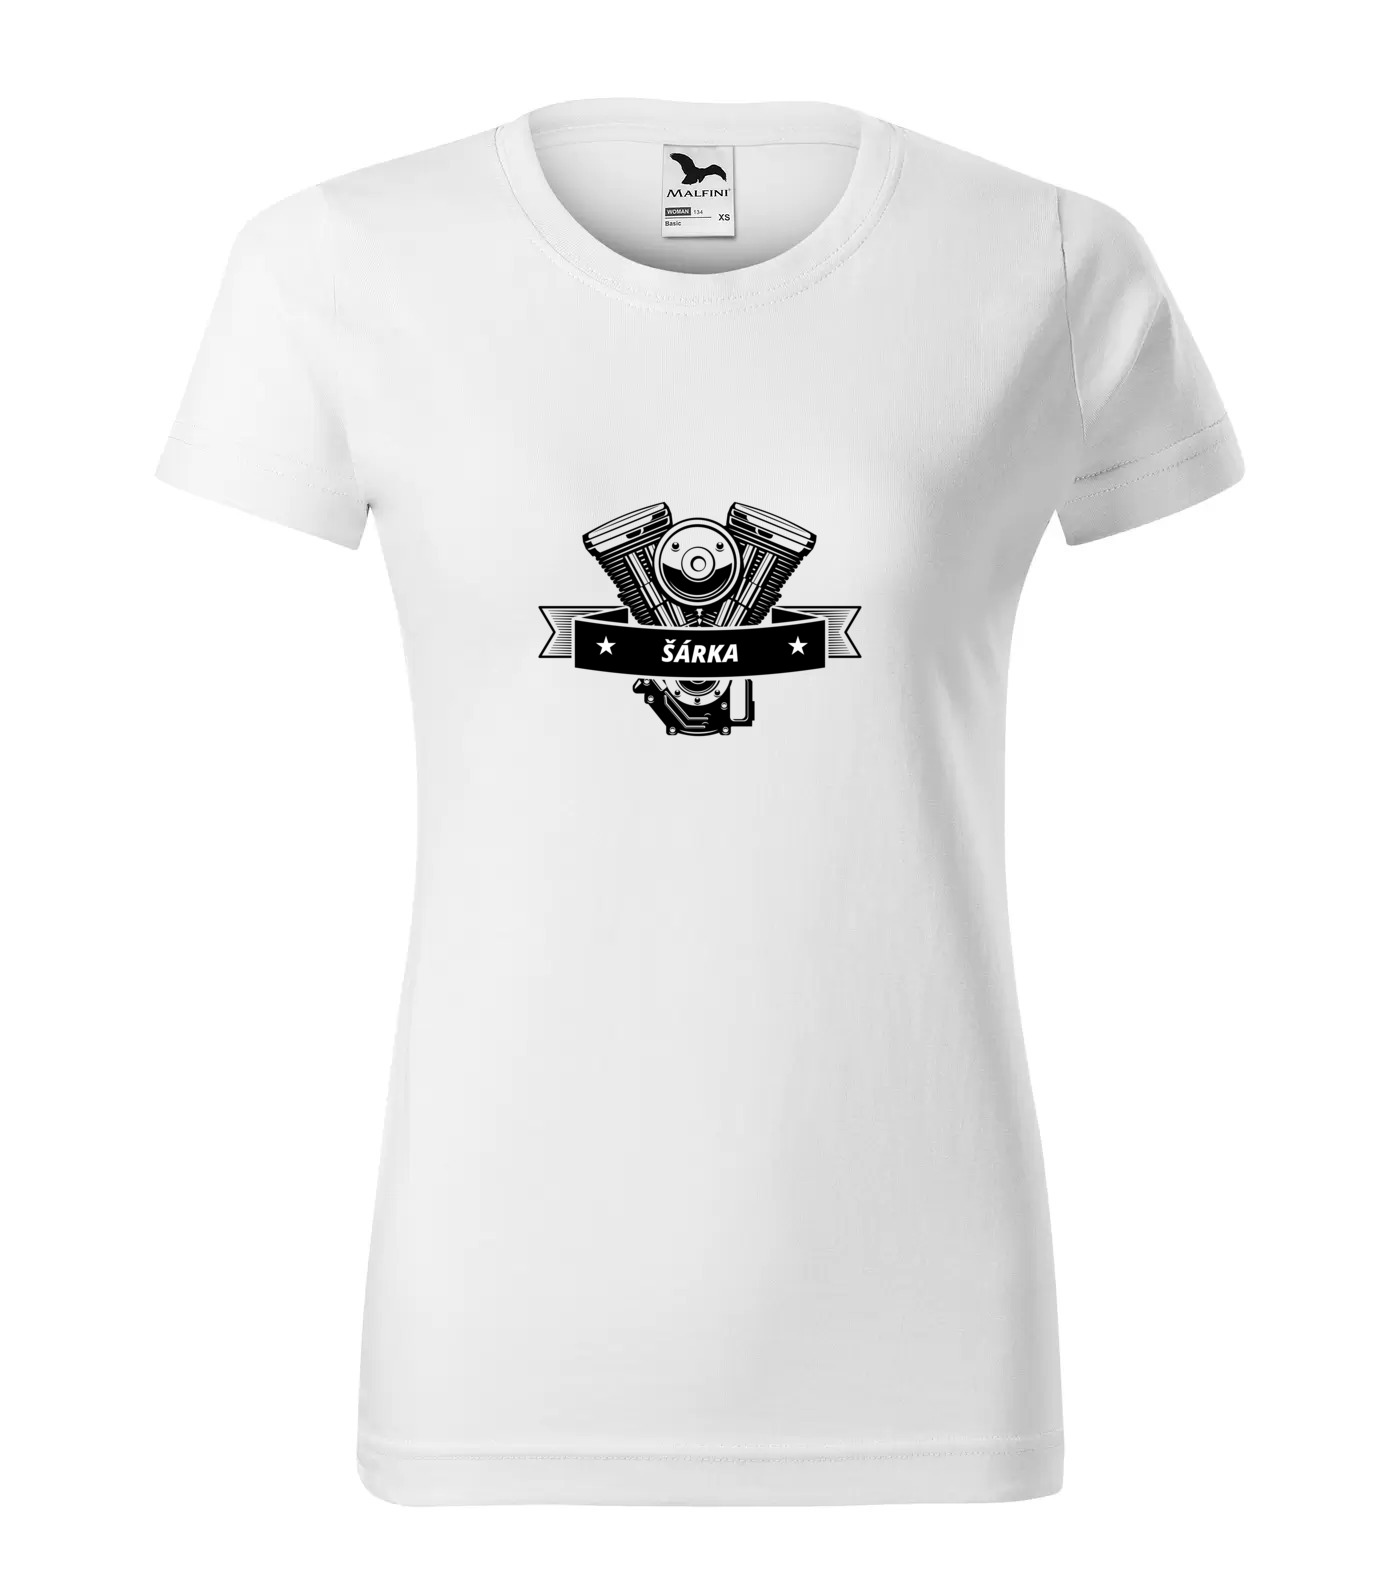 Tričko Motorkářka Šárka